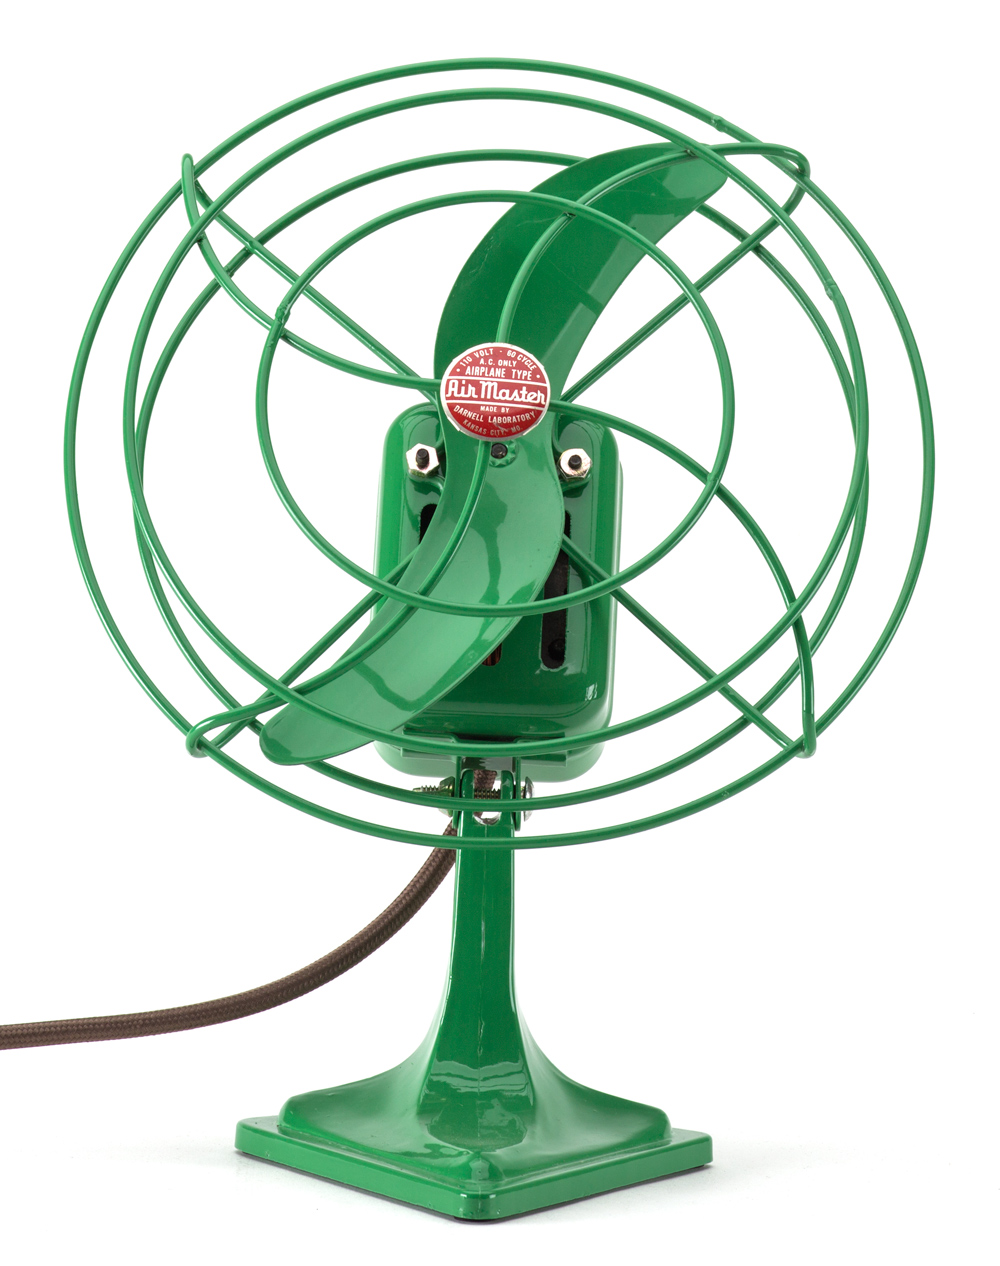 AIR-MASTER-Restored-Green-Fan-RAH_6136.F13-Edit.jpg